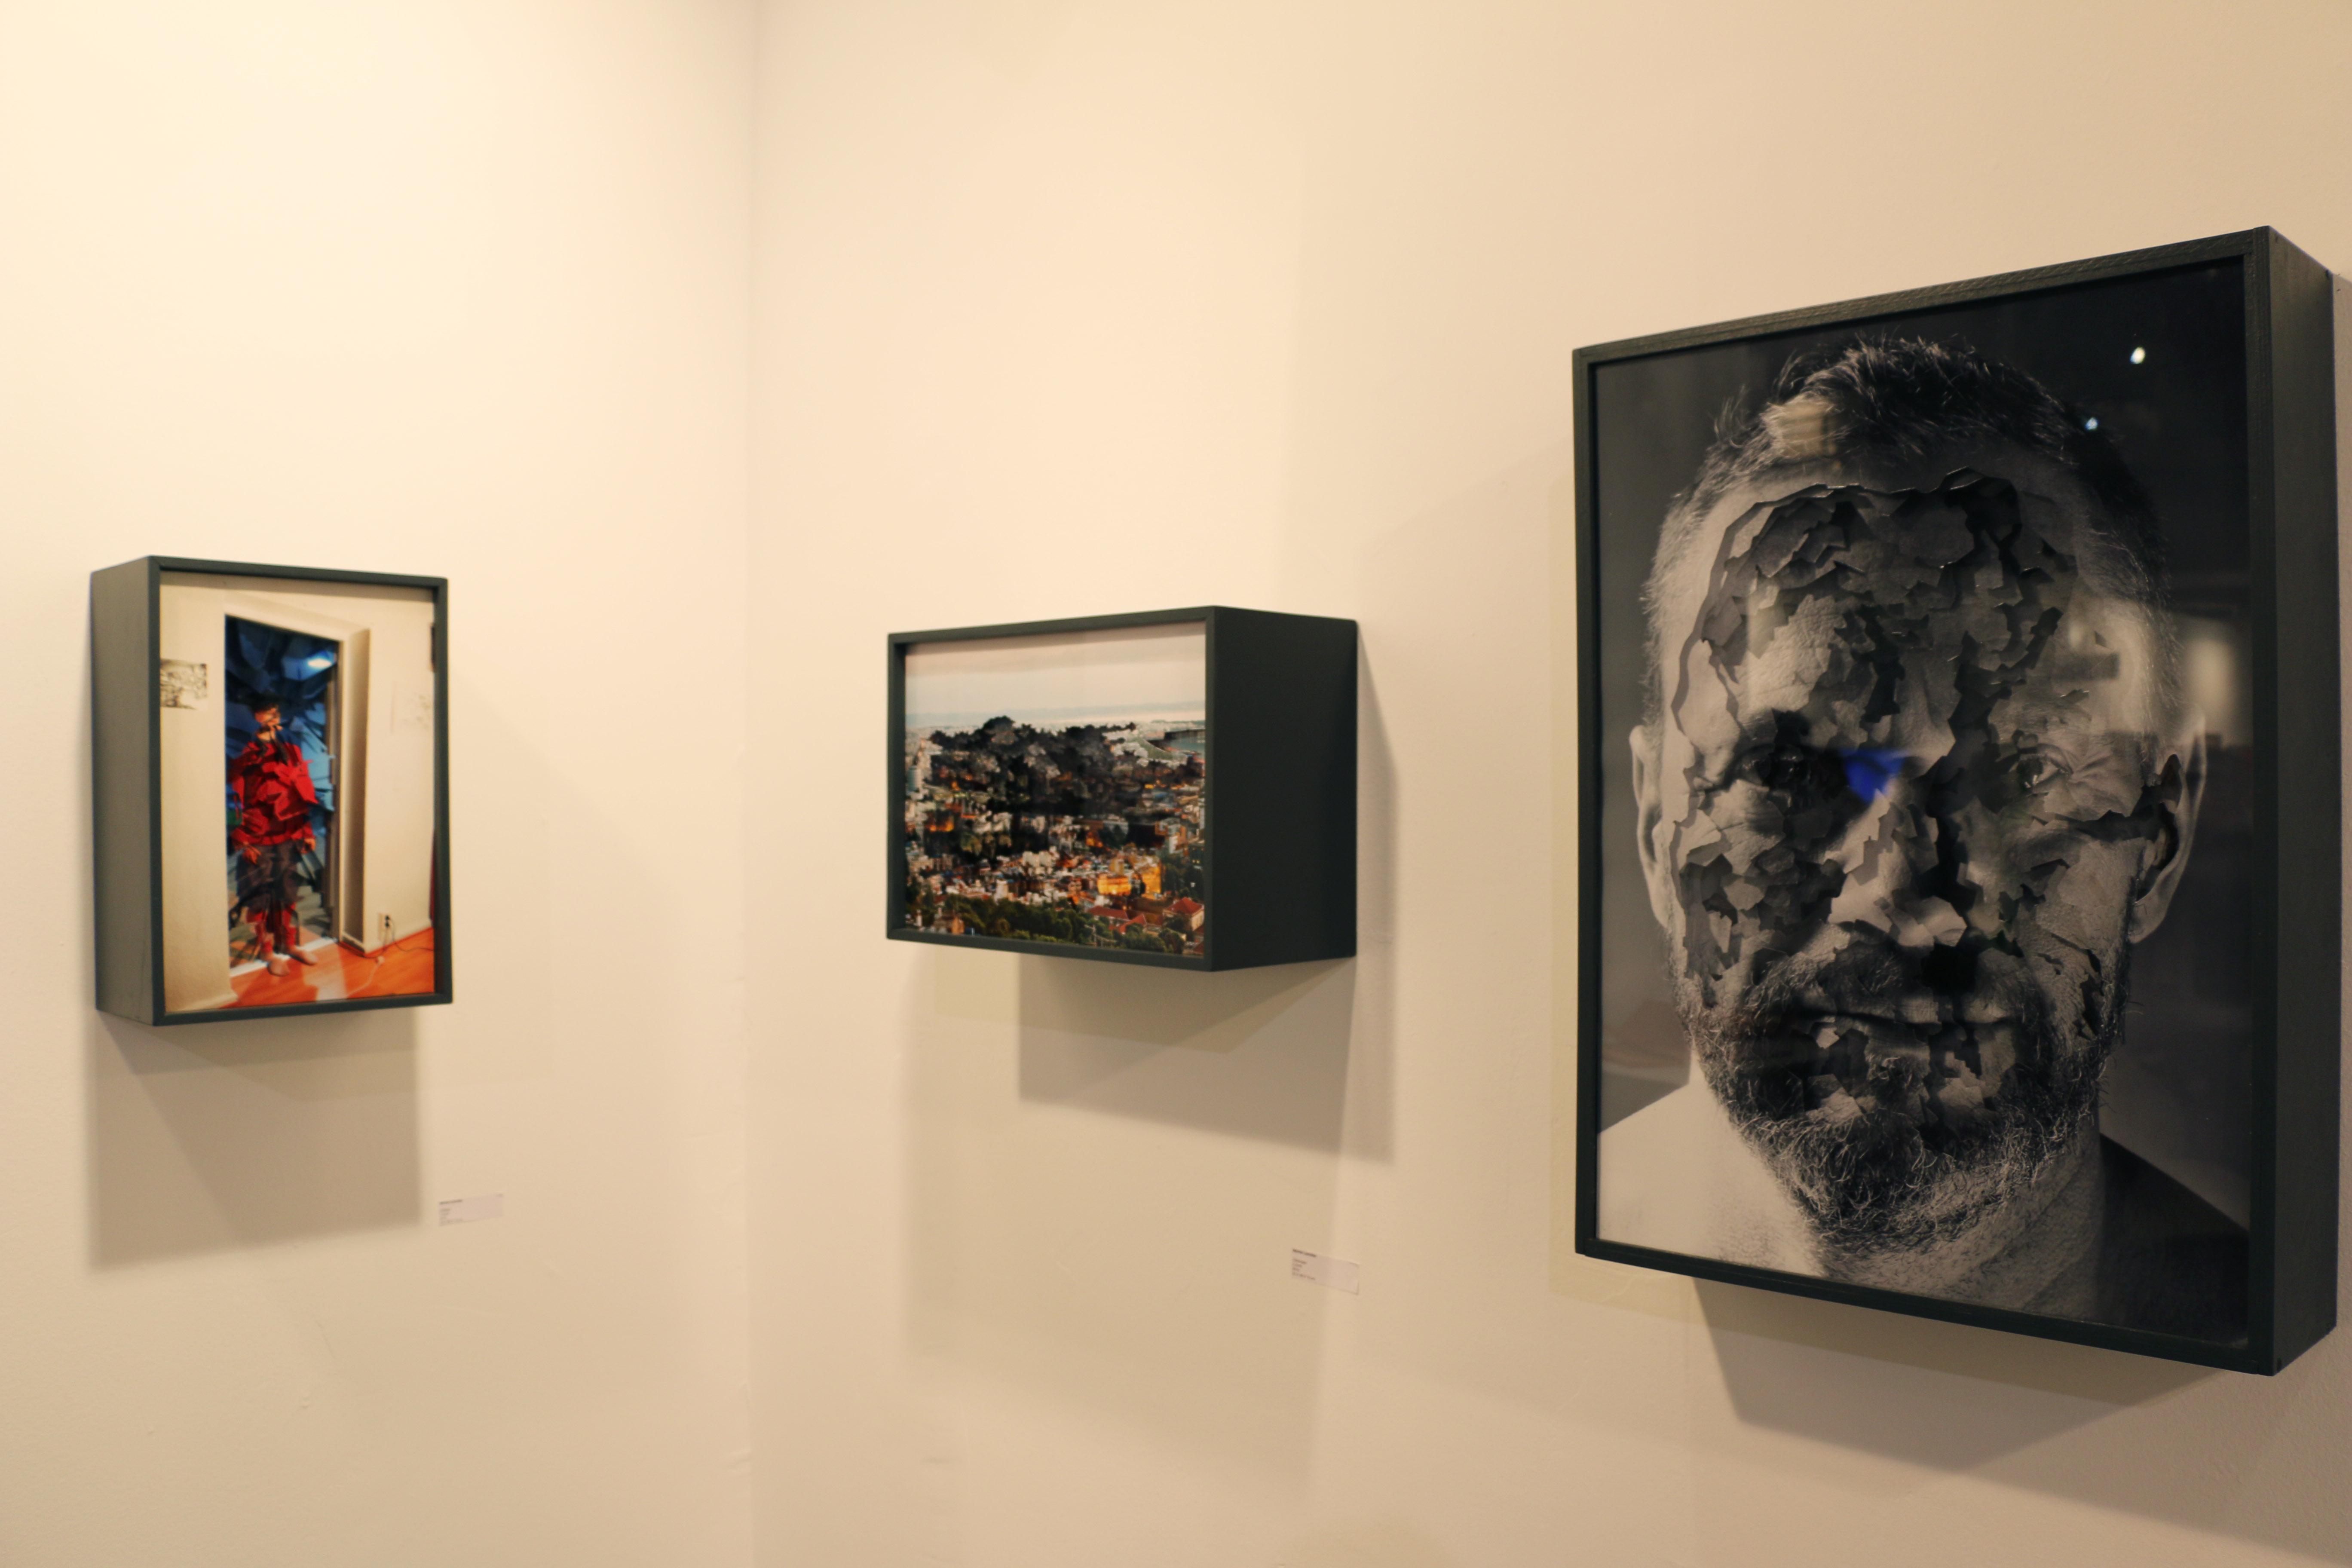 Nitra Gallery, Θεσσαλονίκη - © Δανάη Κωτσάκη